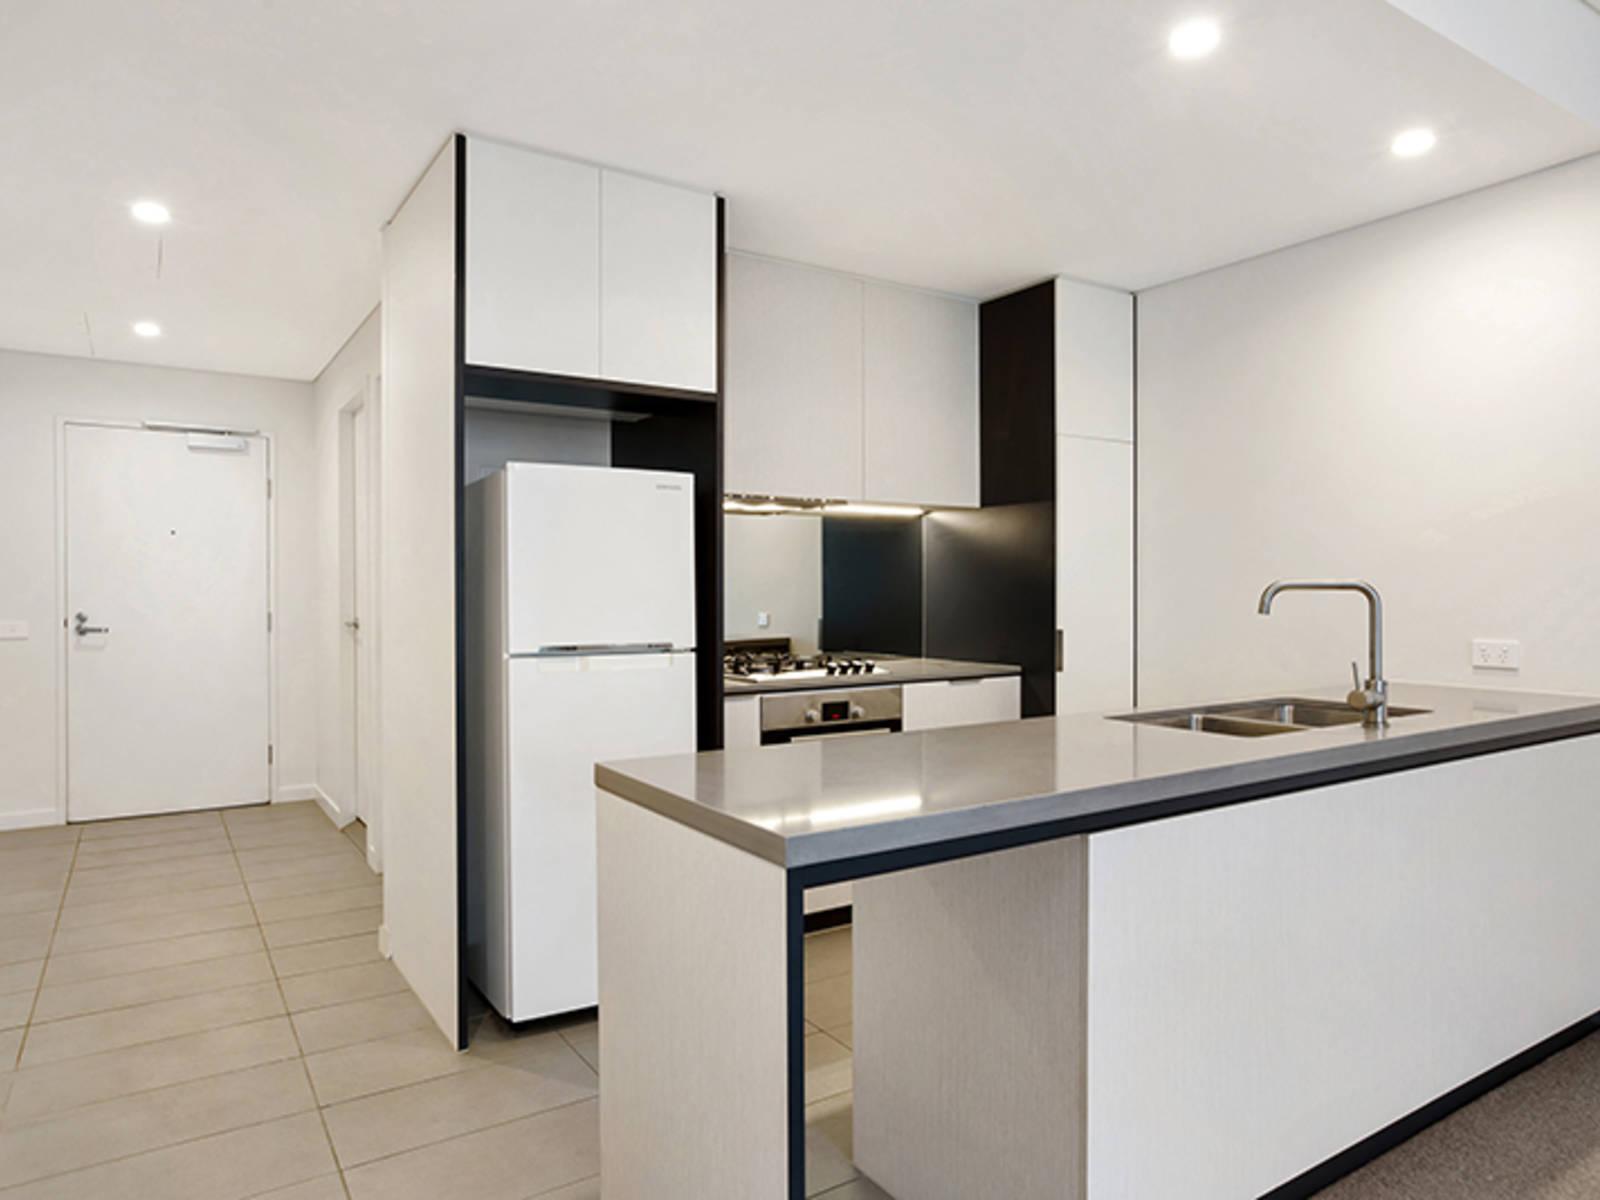 702/21-37 Waitara Avenue, Waitara NSW 2077 - Unit Leased